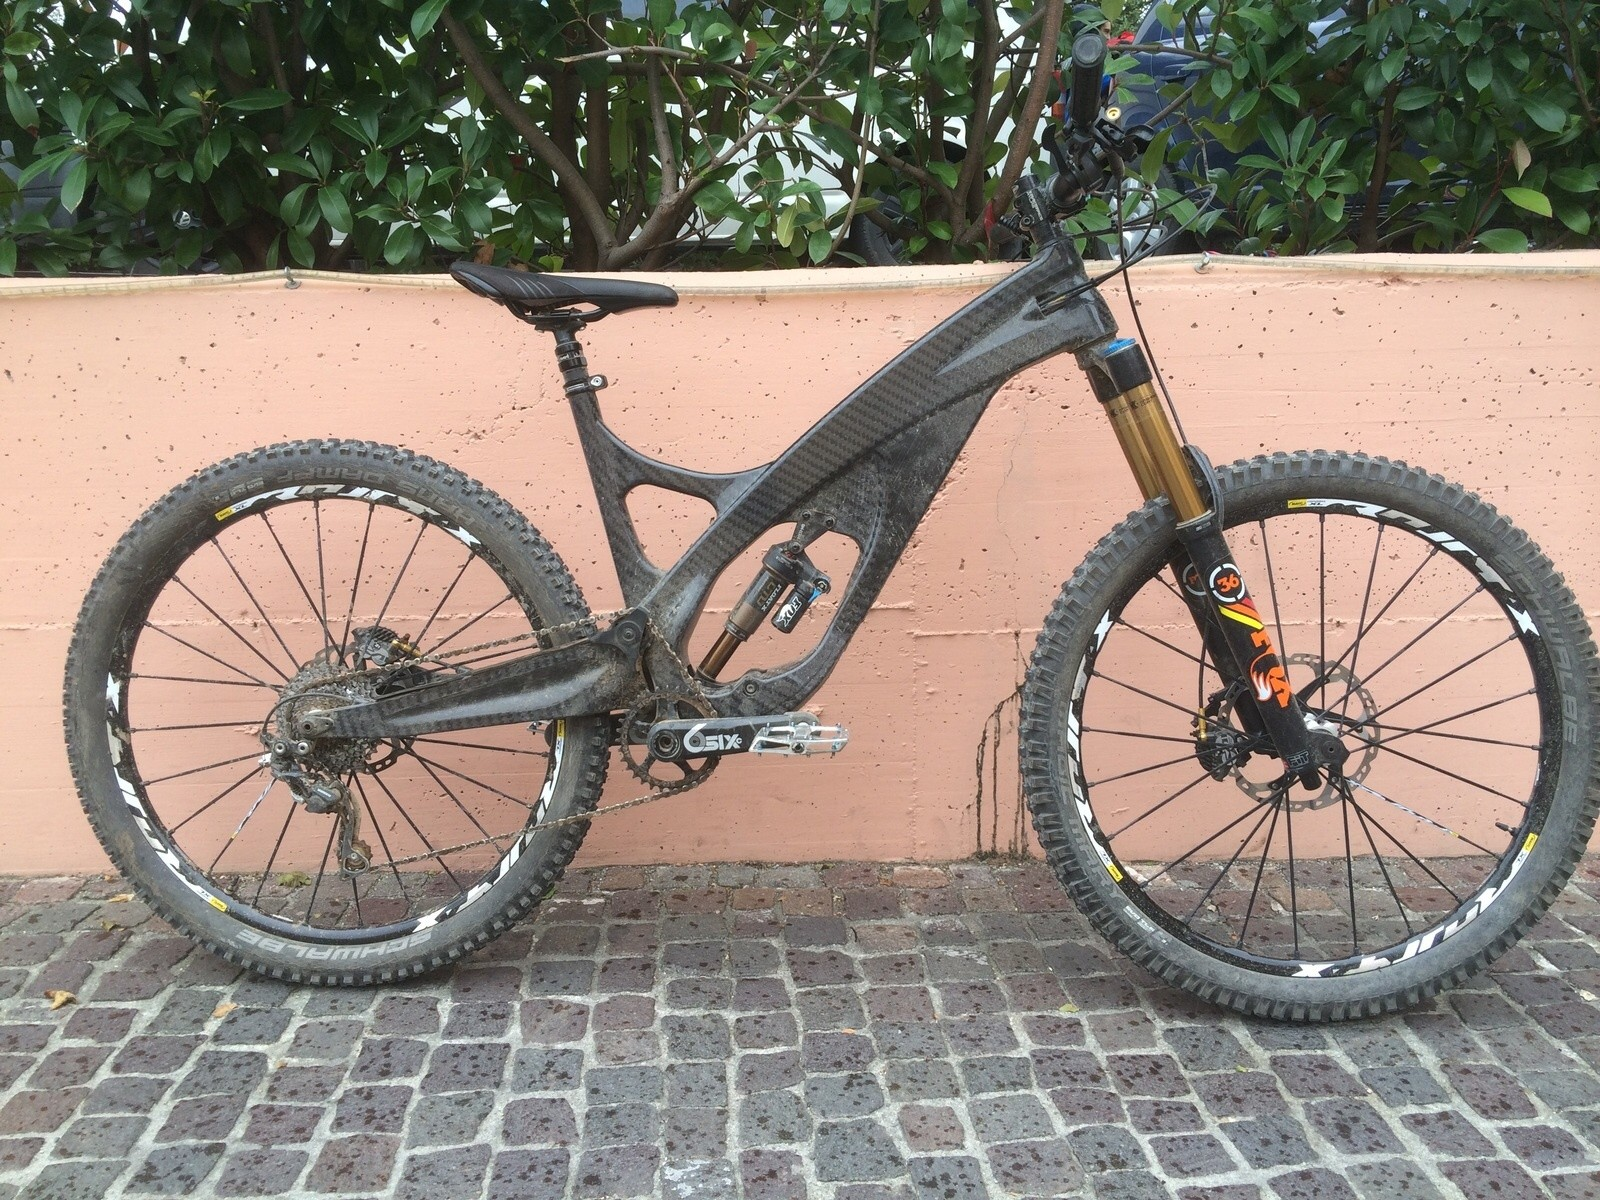 Prototype Carbon Enduro Bike from the UK - Arbr Saker - Prototype Carbon Enduro Bike from the UK - Arbr Saker - Mountain Biking Pictures - Vital MTB